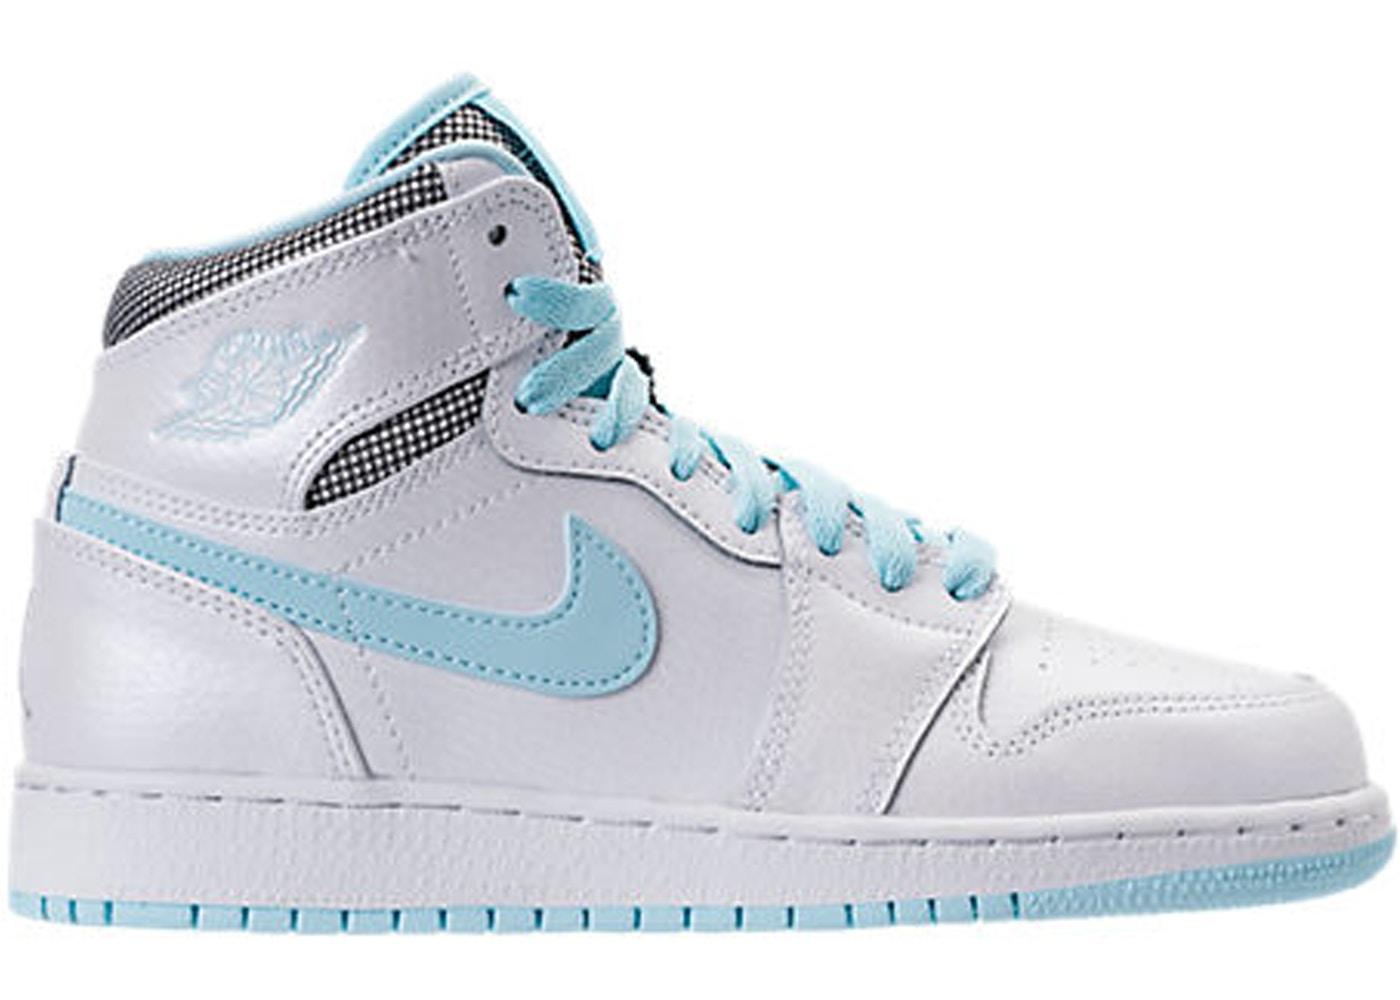 Jordan 1 Retro High White Still Blue Gs 332148 106